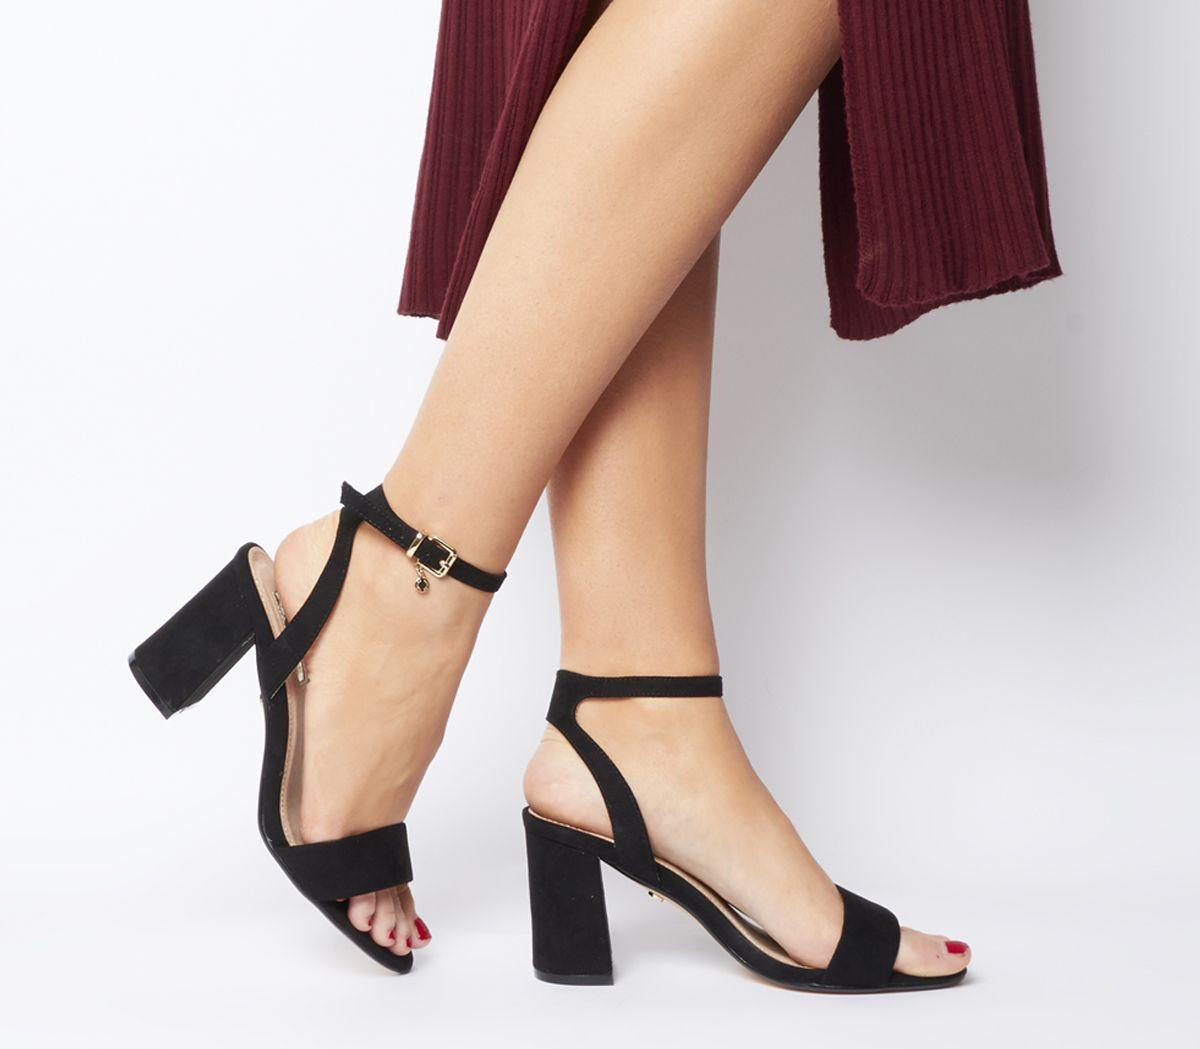 a7c8f9384 Office Marigold Strappy Heels Black - Mid Heels